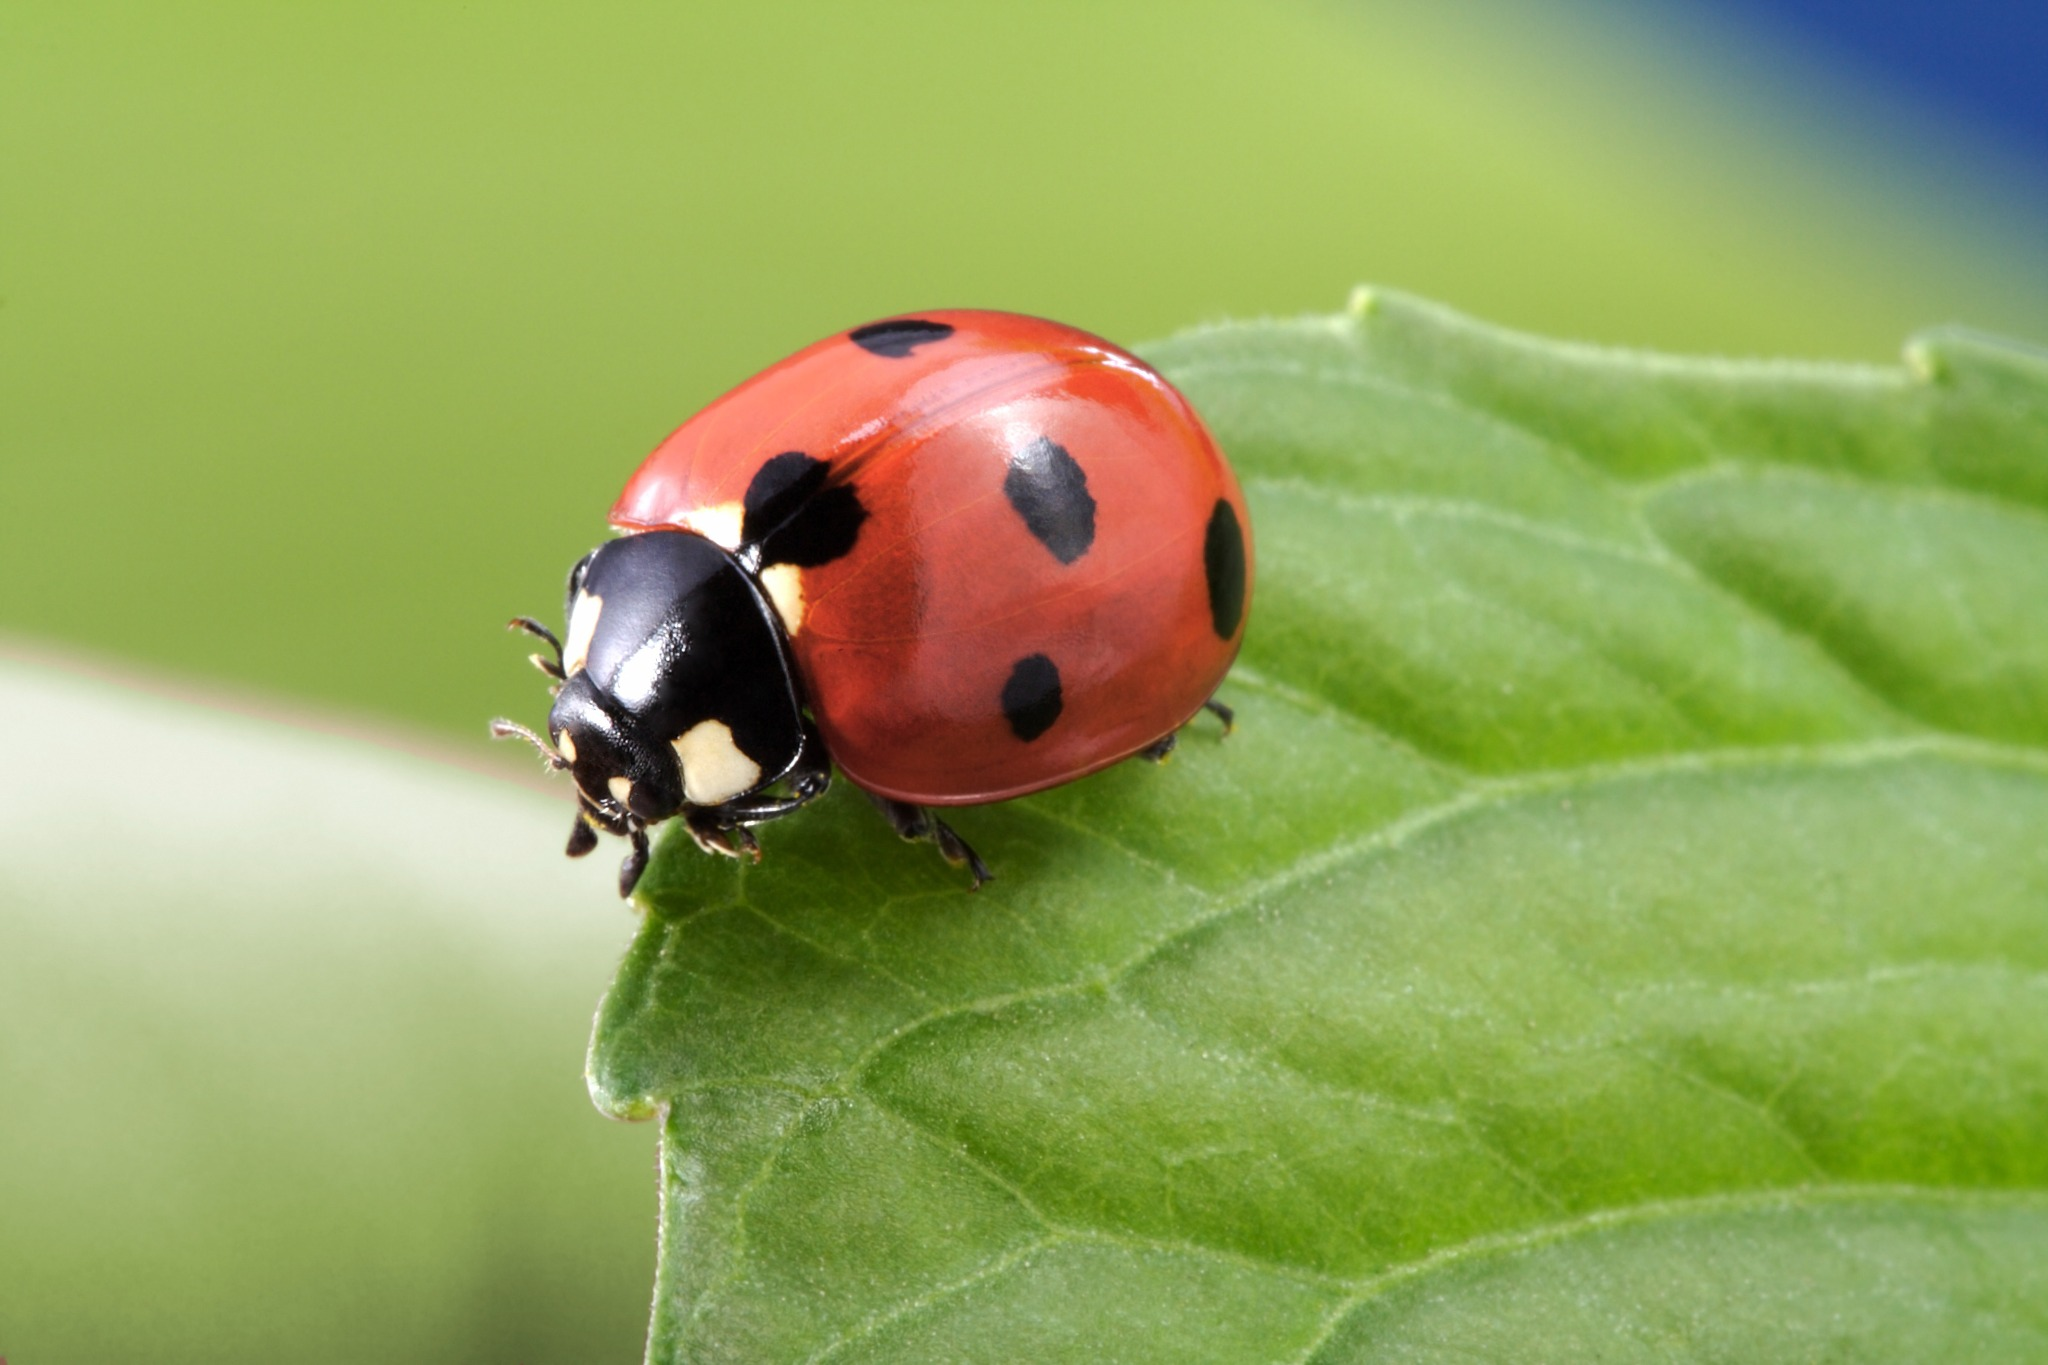 A lady bug on a leaf. Buwch goch gotais a Welsh word that is a term of endearment, and means ladybug.